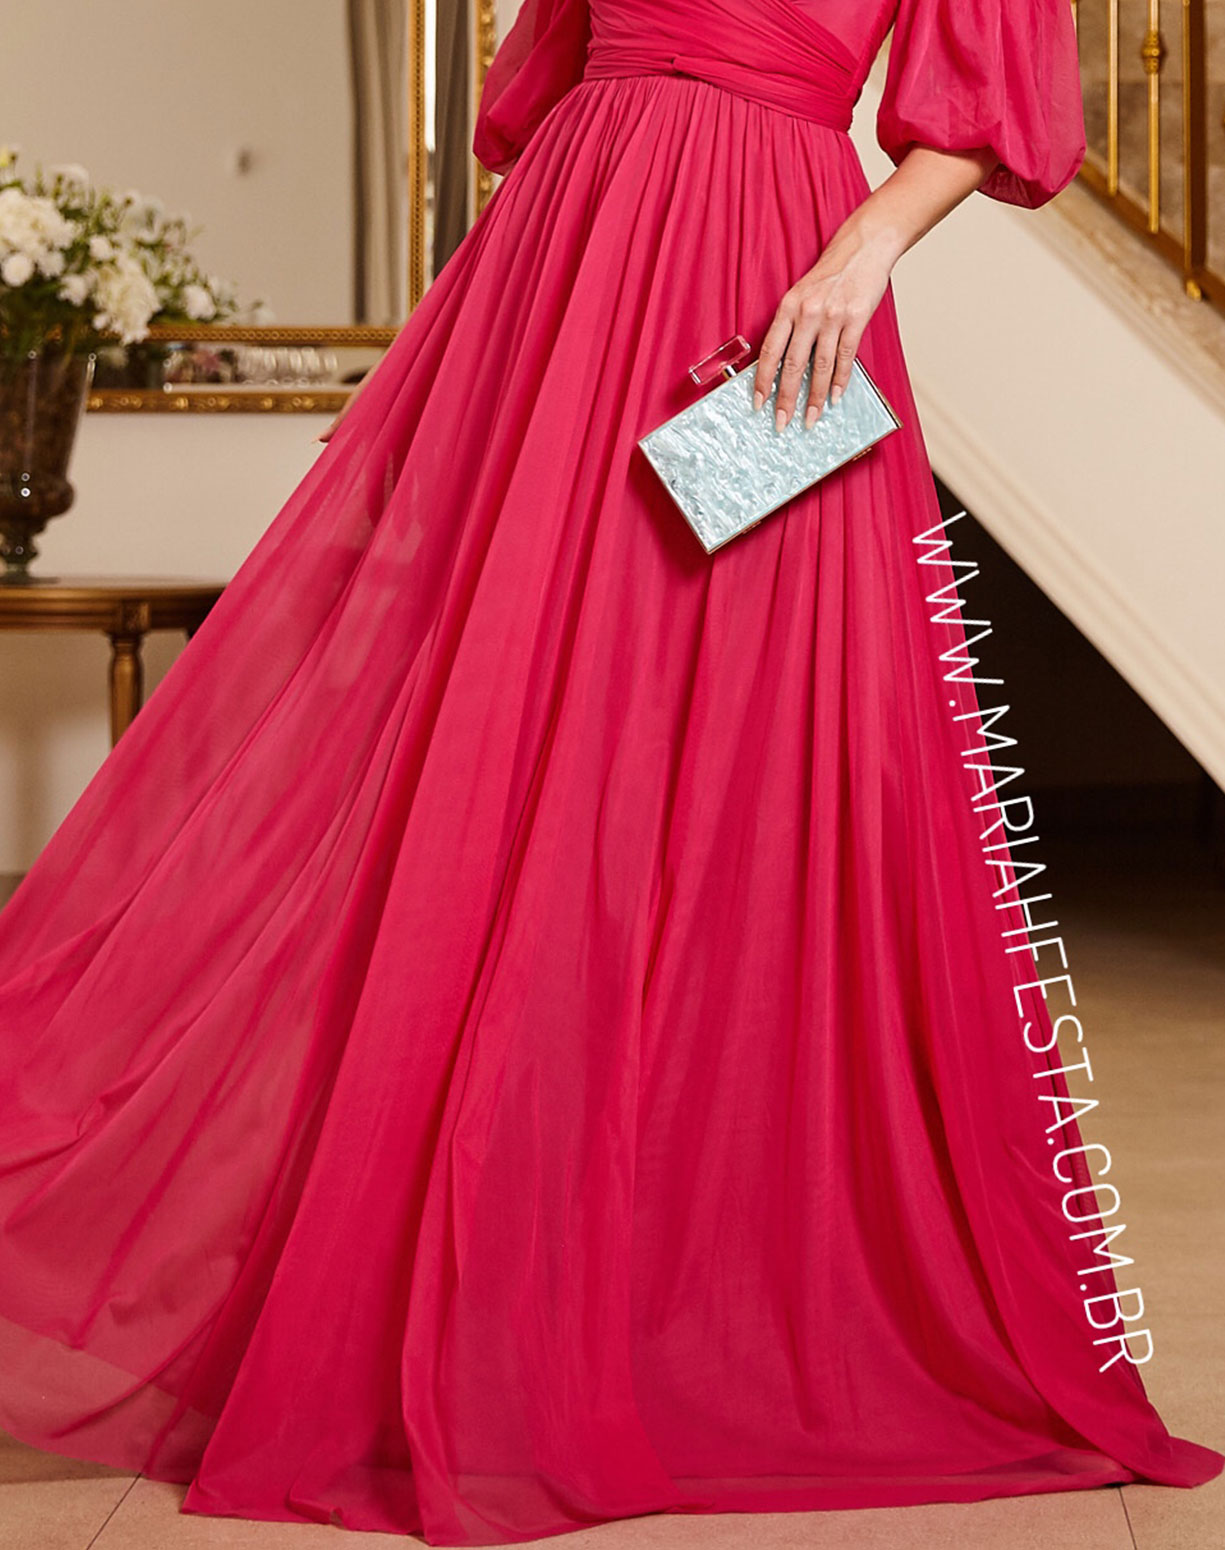 Vestido Rosa Pink em Tule com Manga Ombro a Ombro